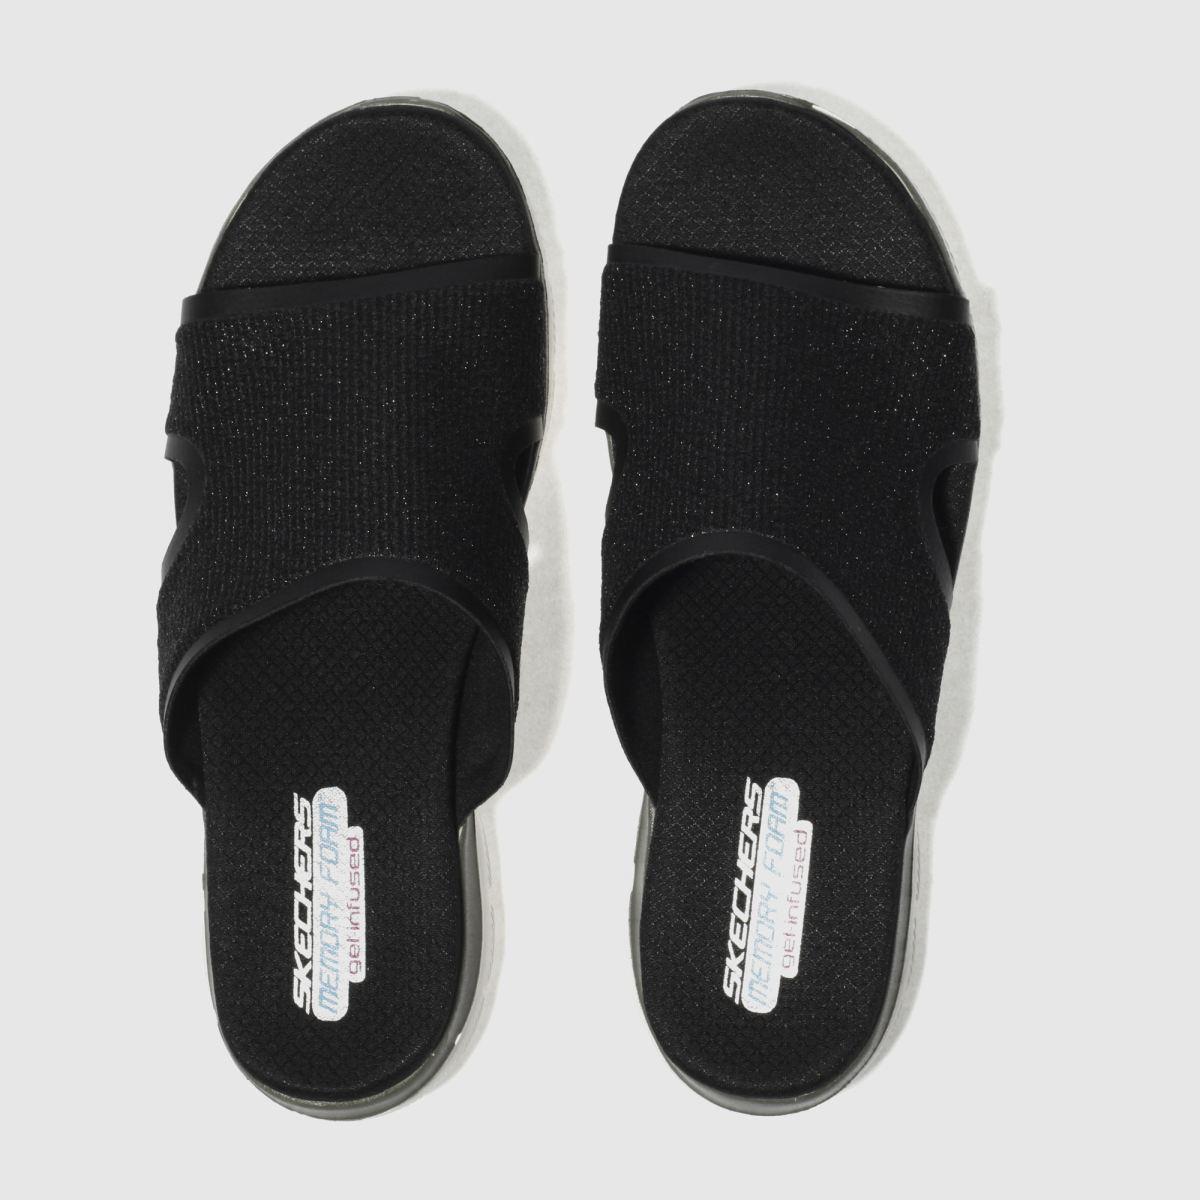 Skechers Black Flex Appeal 2.0 Summer Jam Sandals